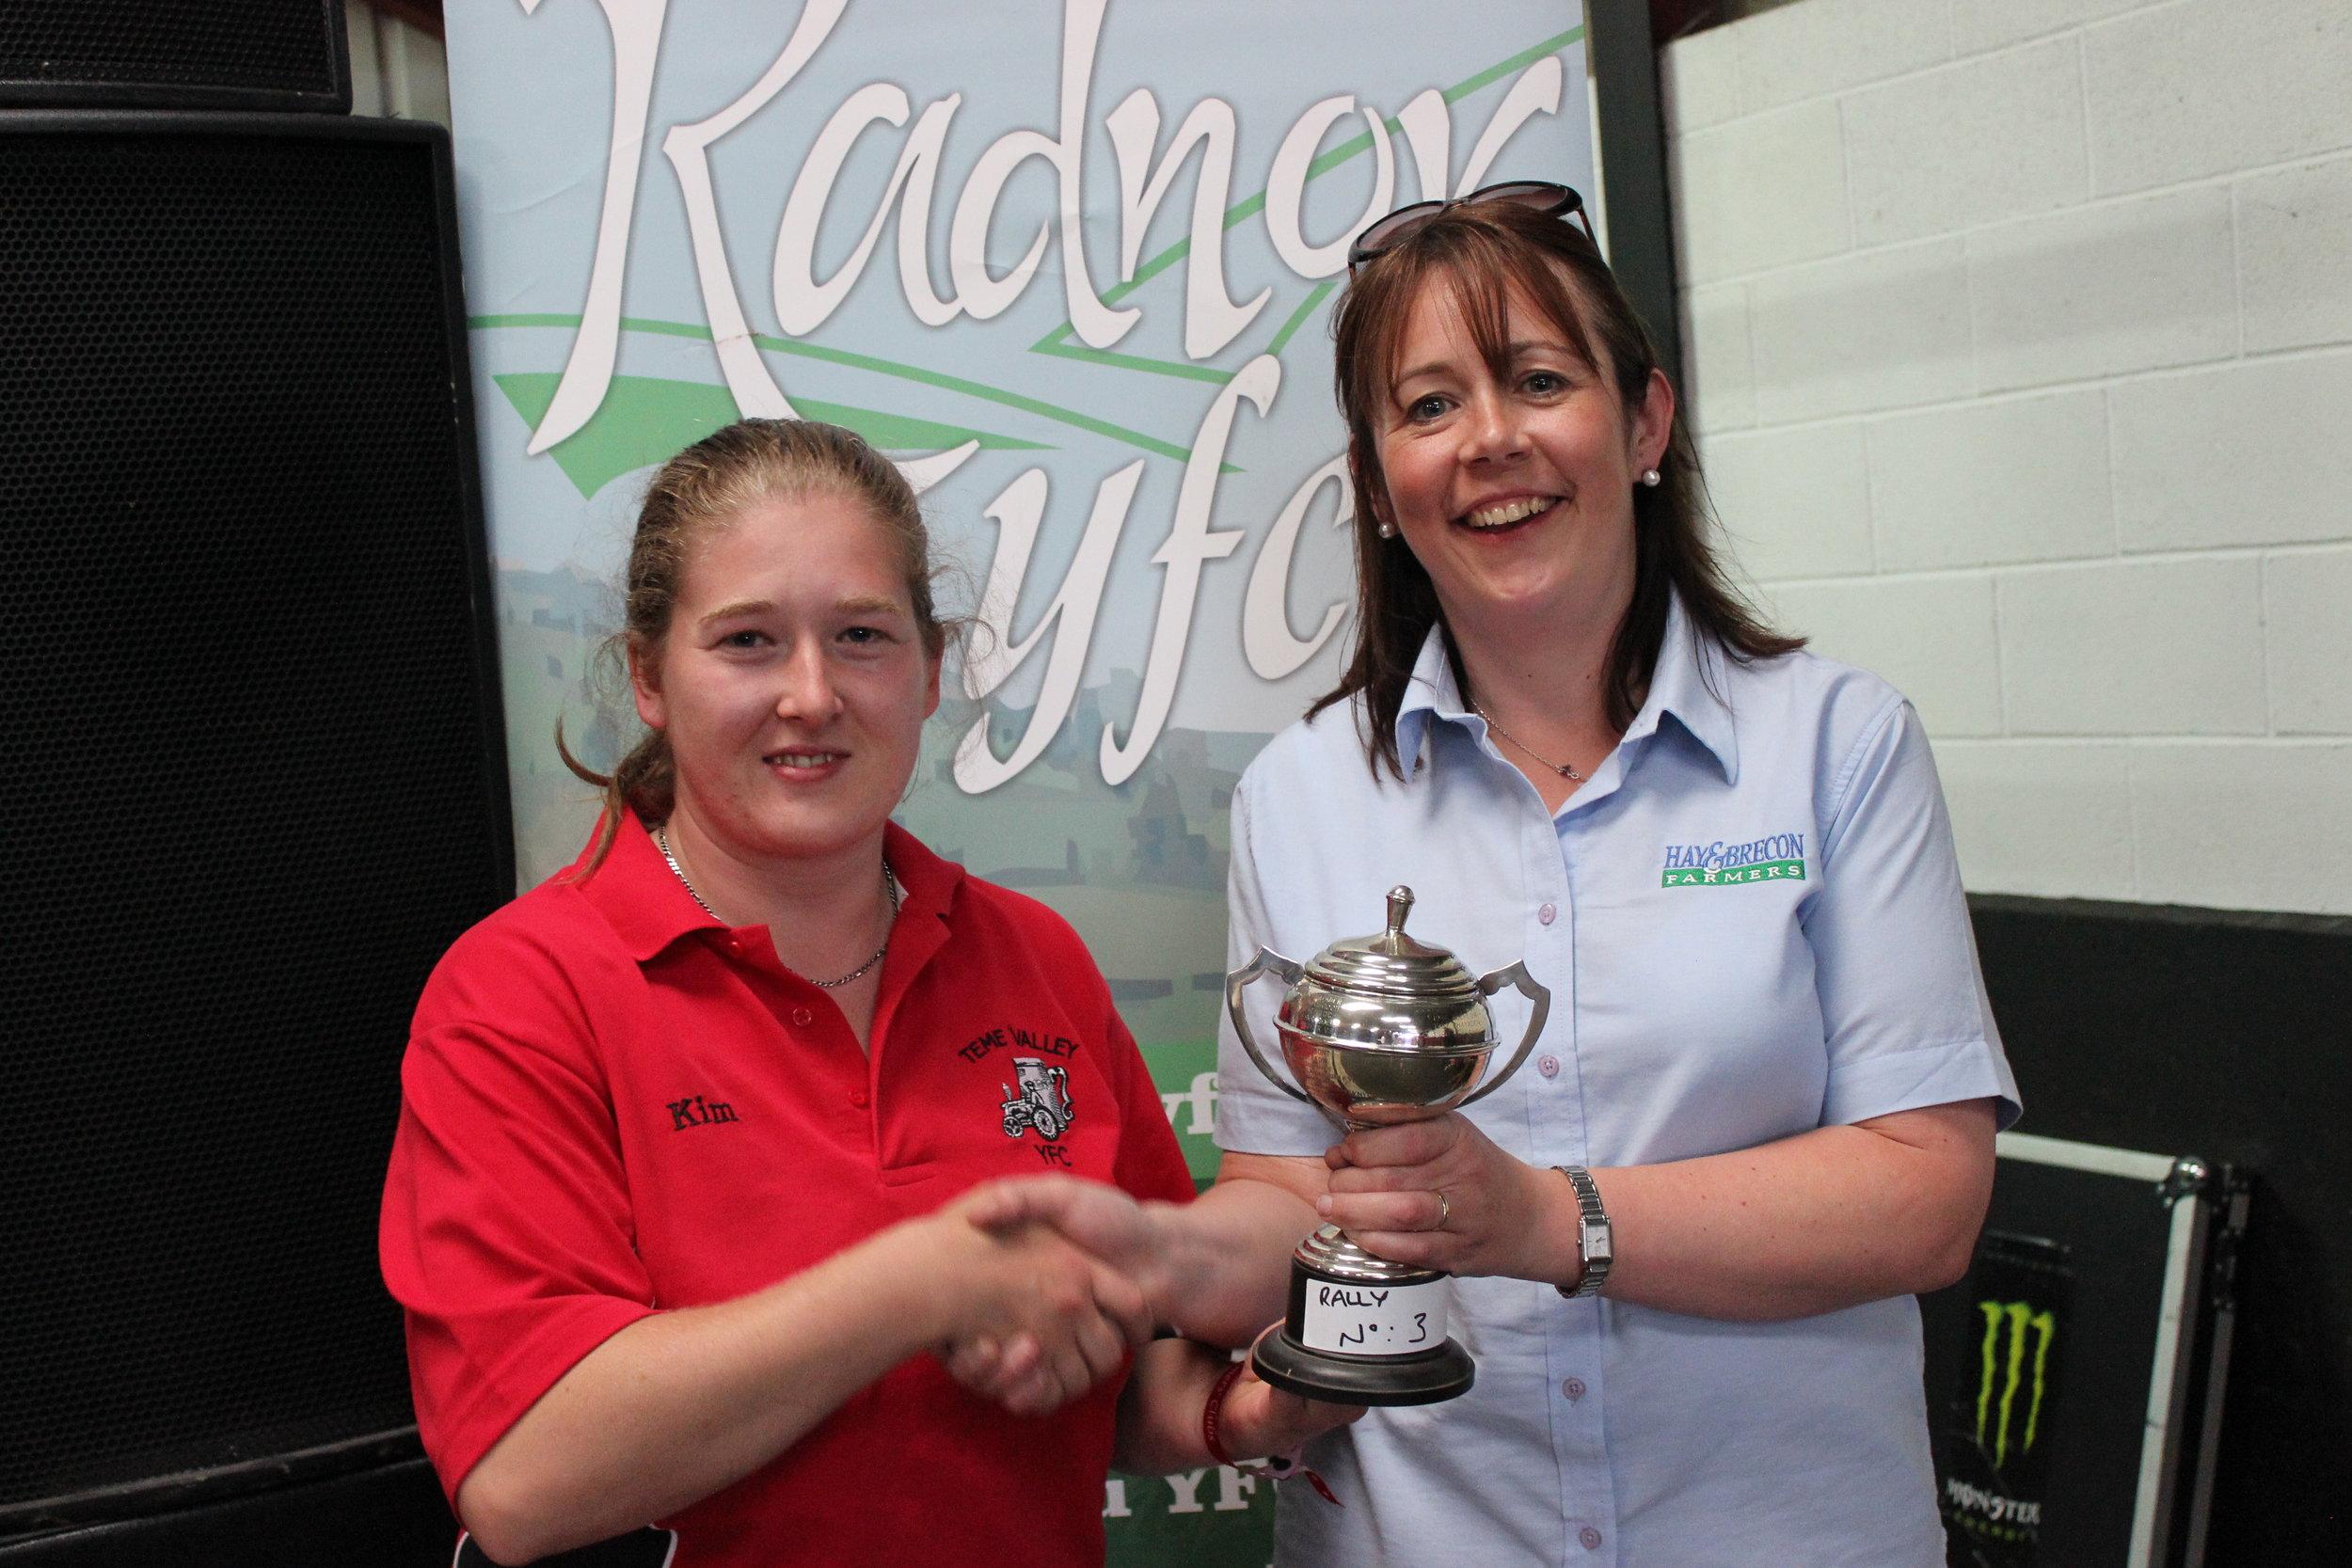 Kim Barnett, Teme Valley YFC - Bevan Lewis Cup / Third placed Club